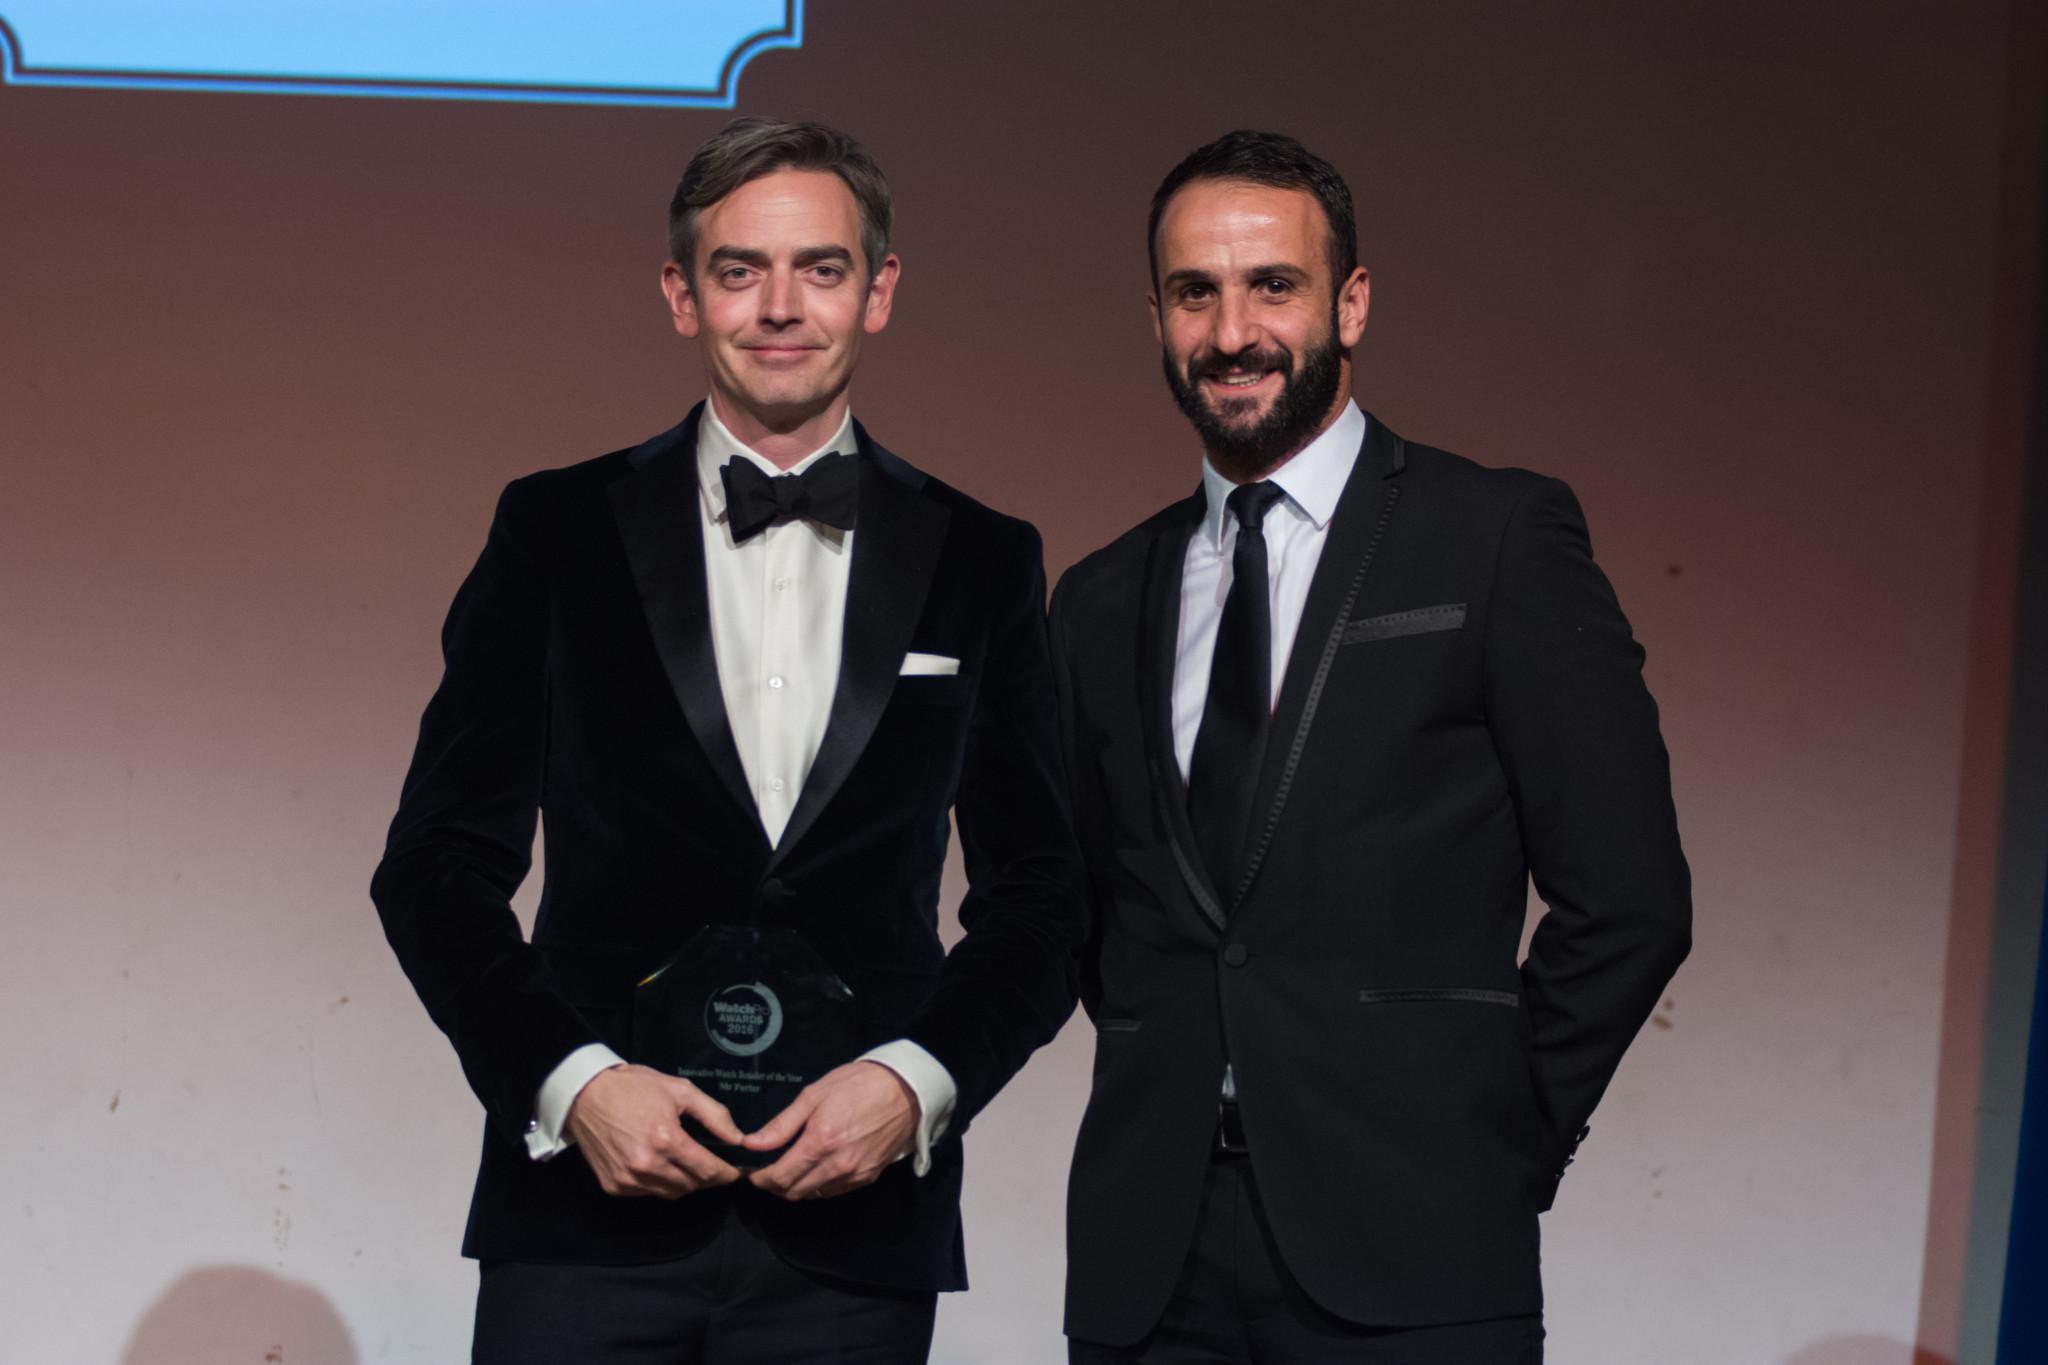 Watch Pro Magazine Awards,2016, Shakespeare's Globe